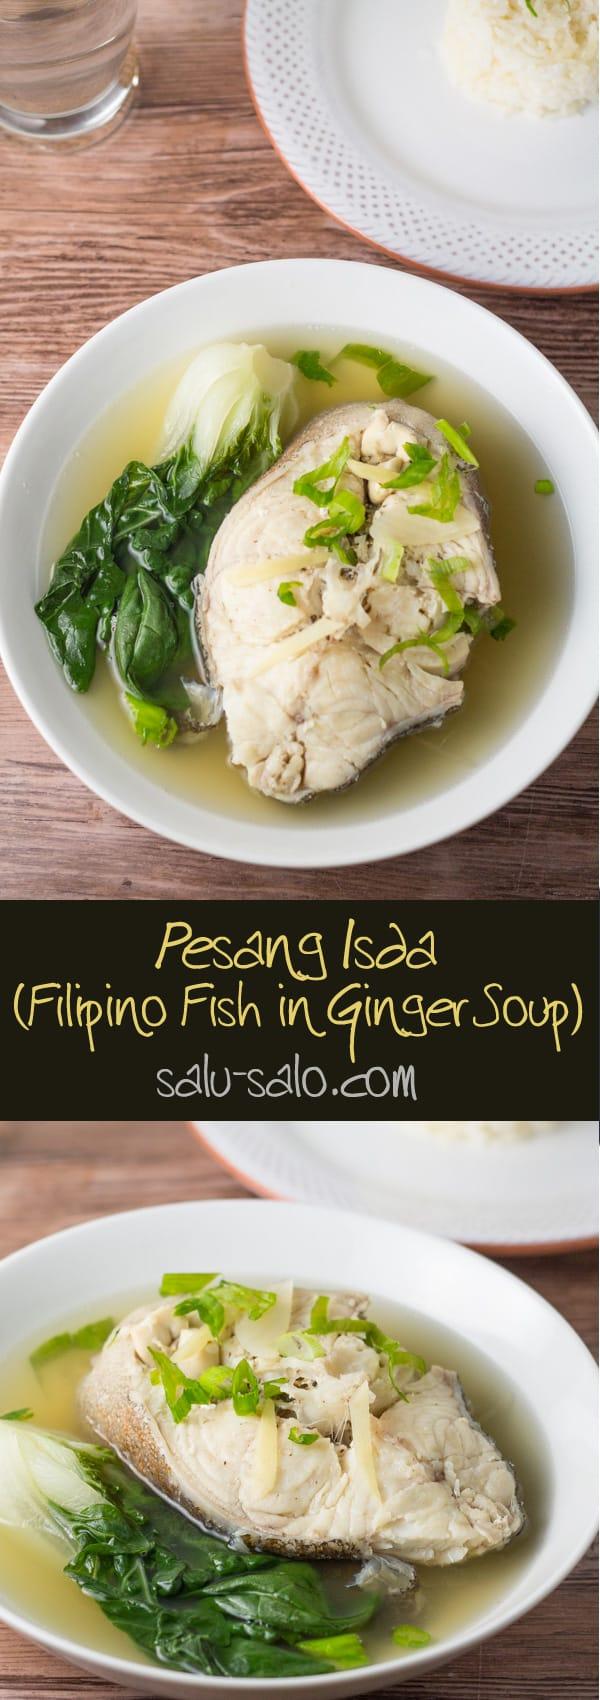 Pesang Isda (Fish in Ginger Soup)